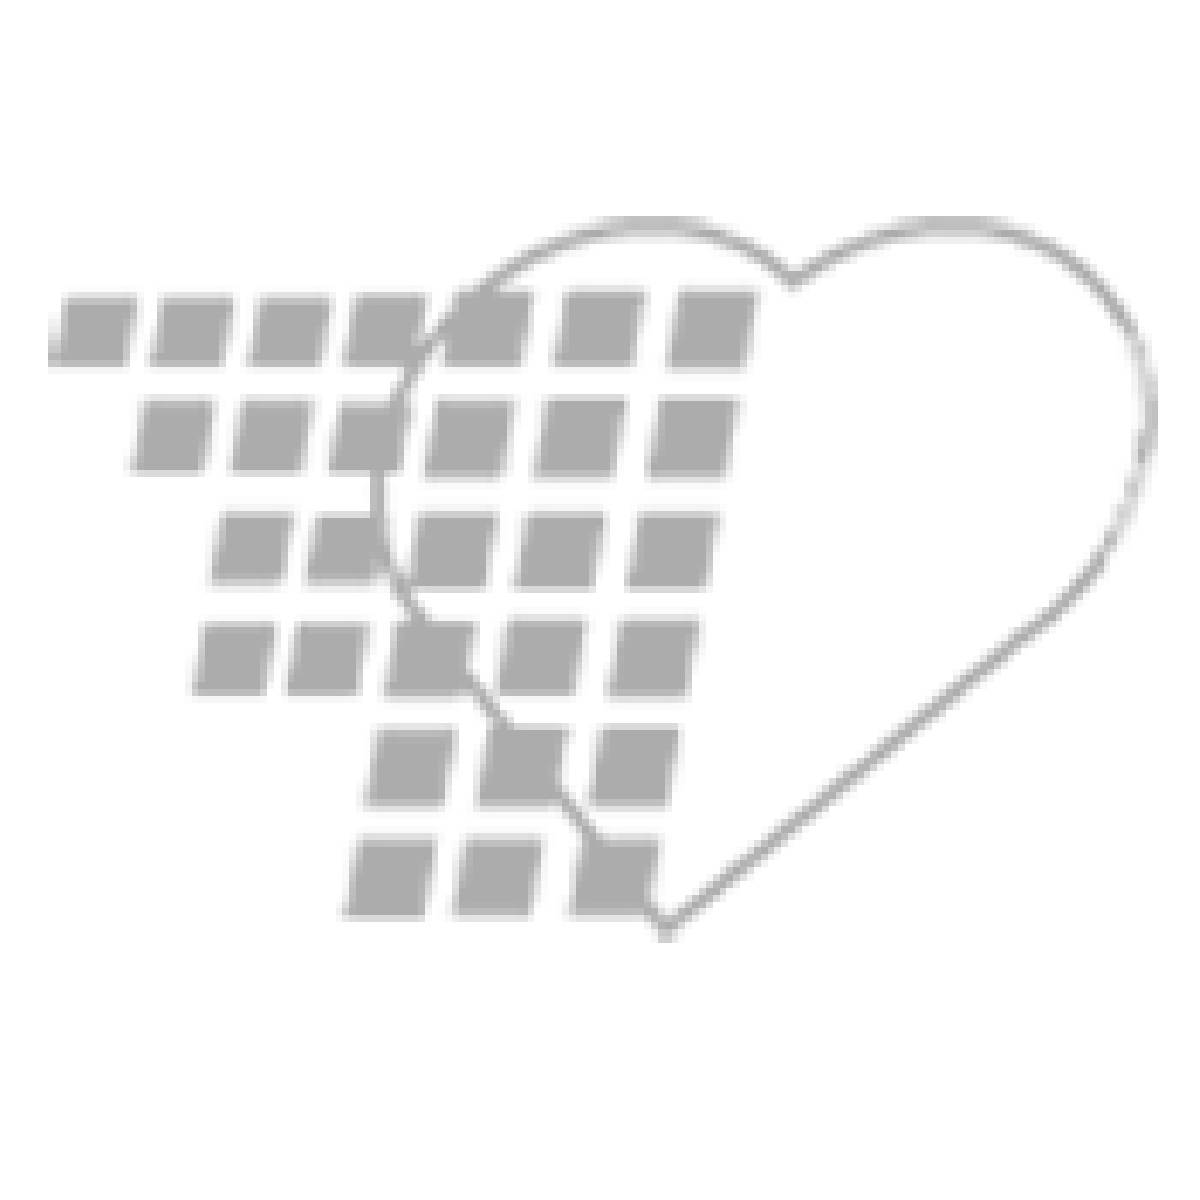 11-81-0124 TruSkin Suture Skin with Holder & Pins